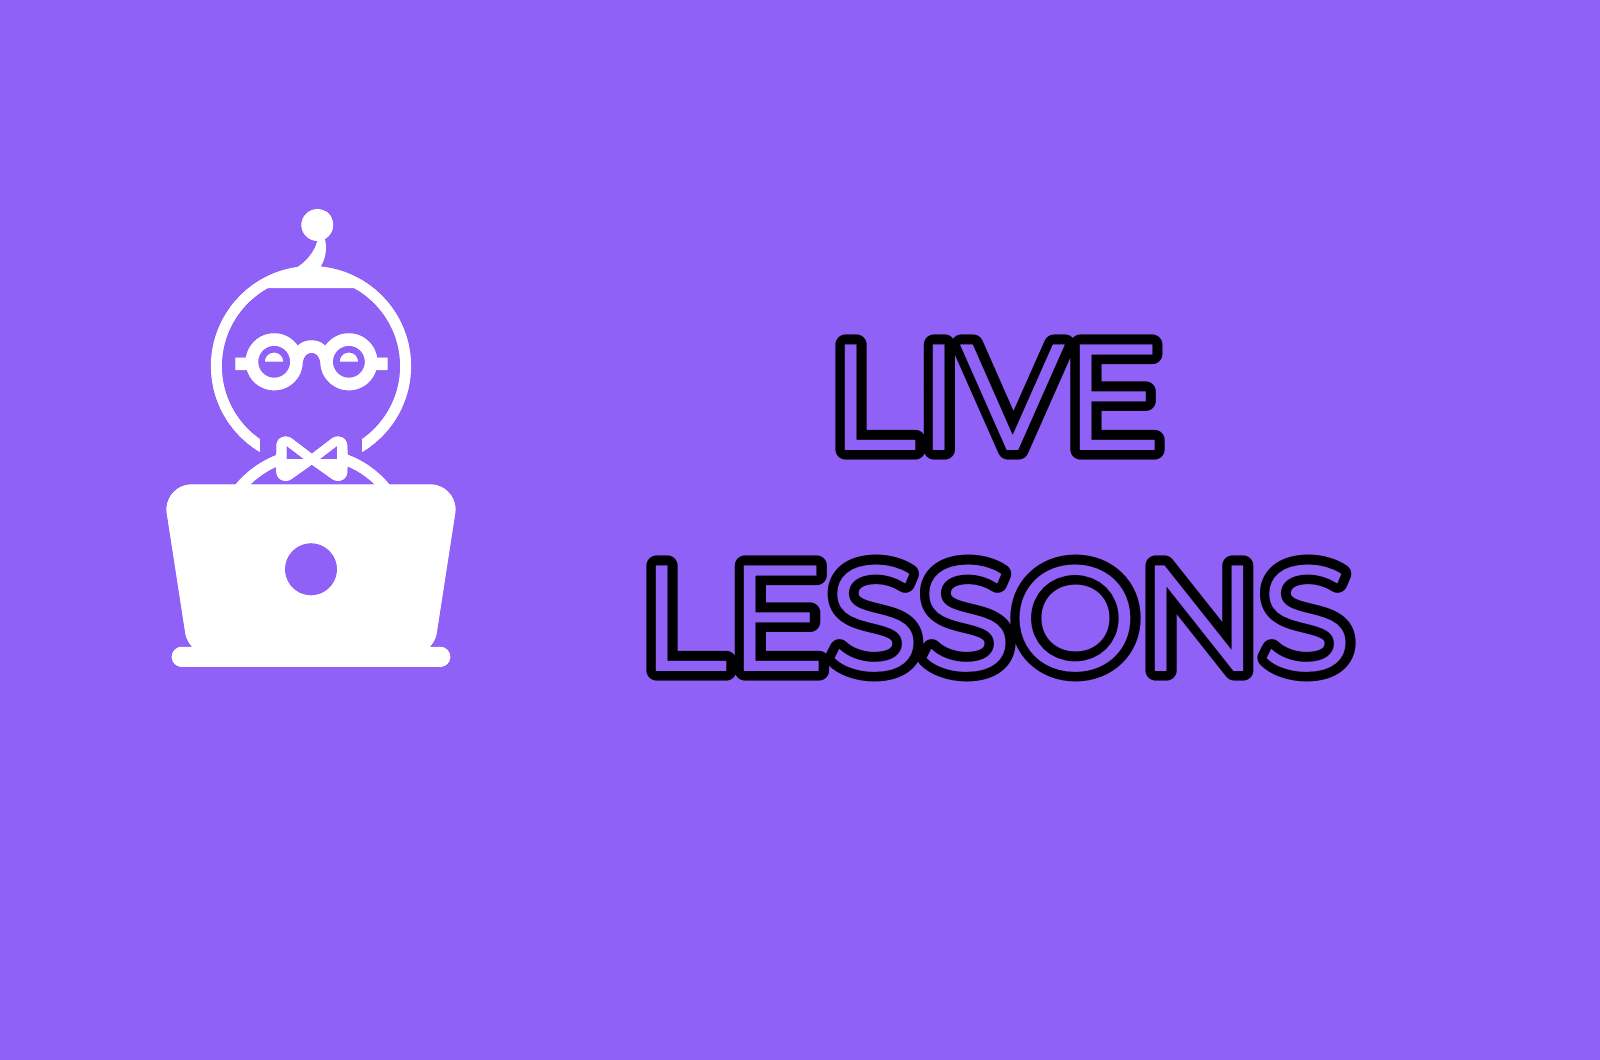 LIVE LESSONS    ENTER